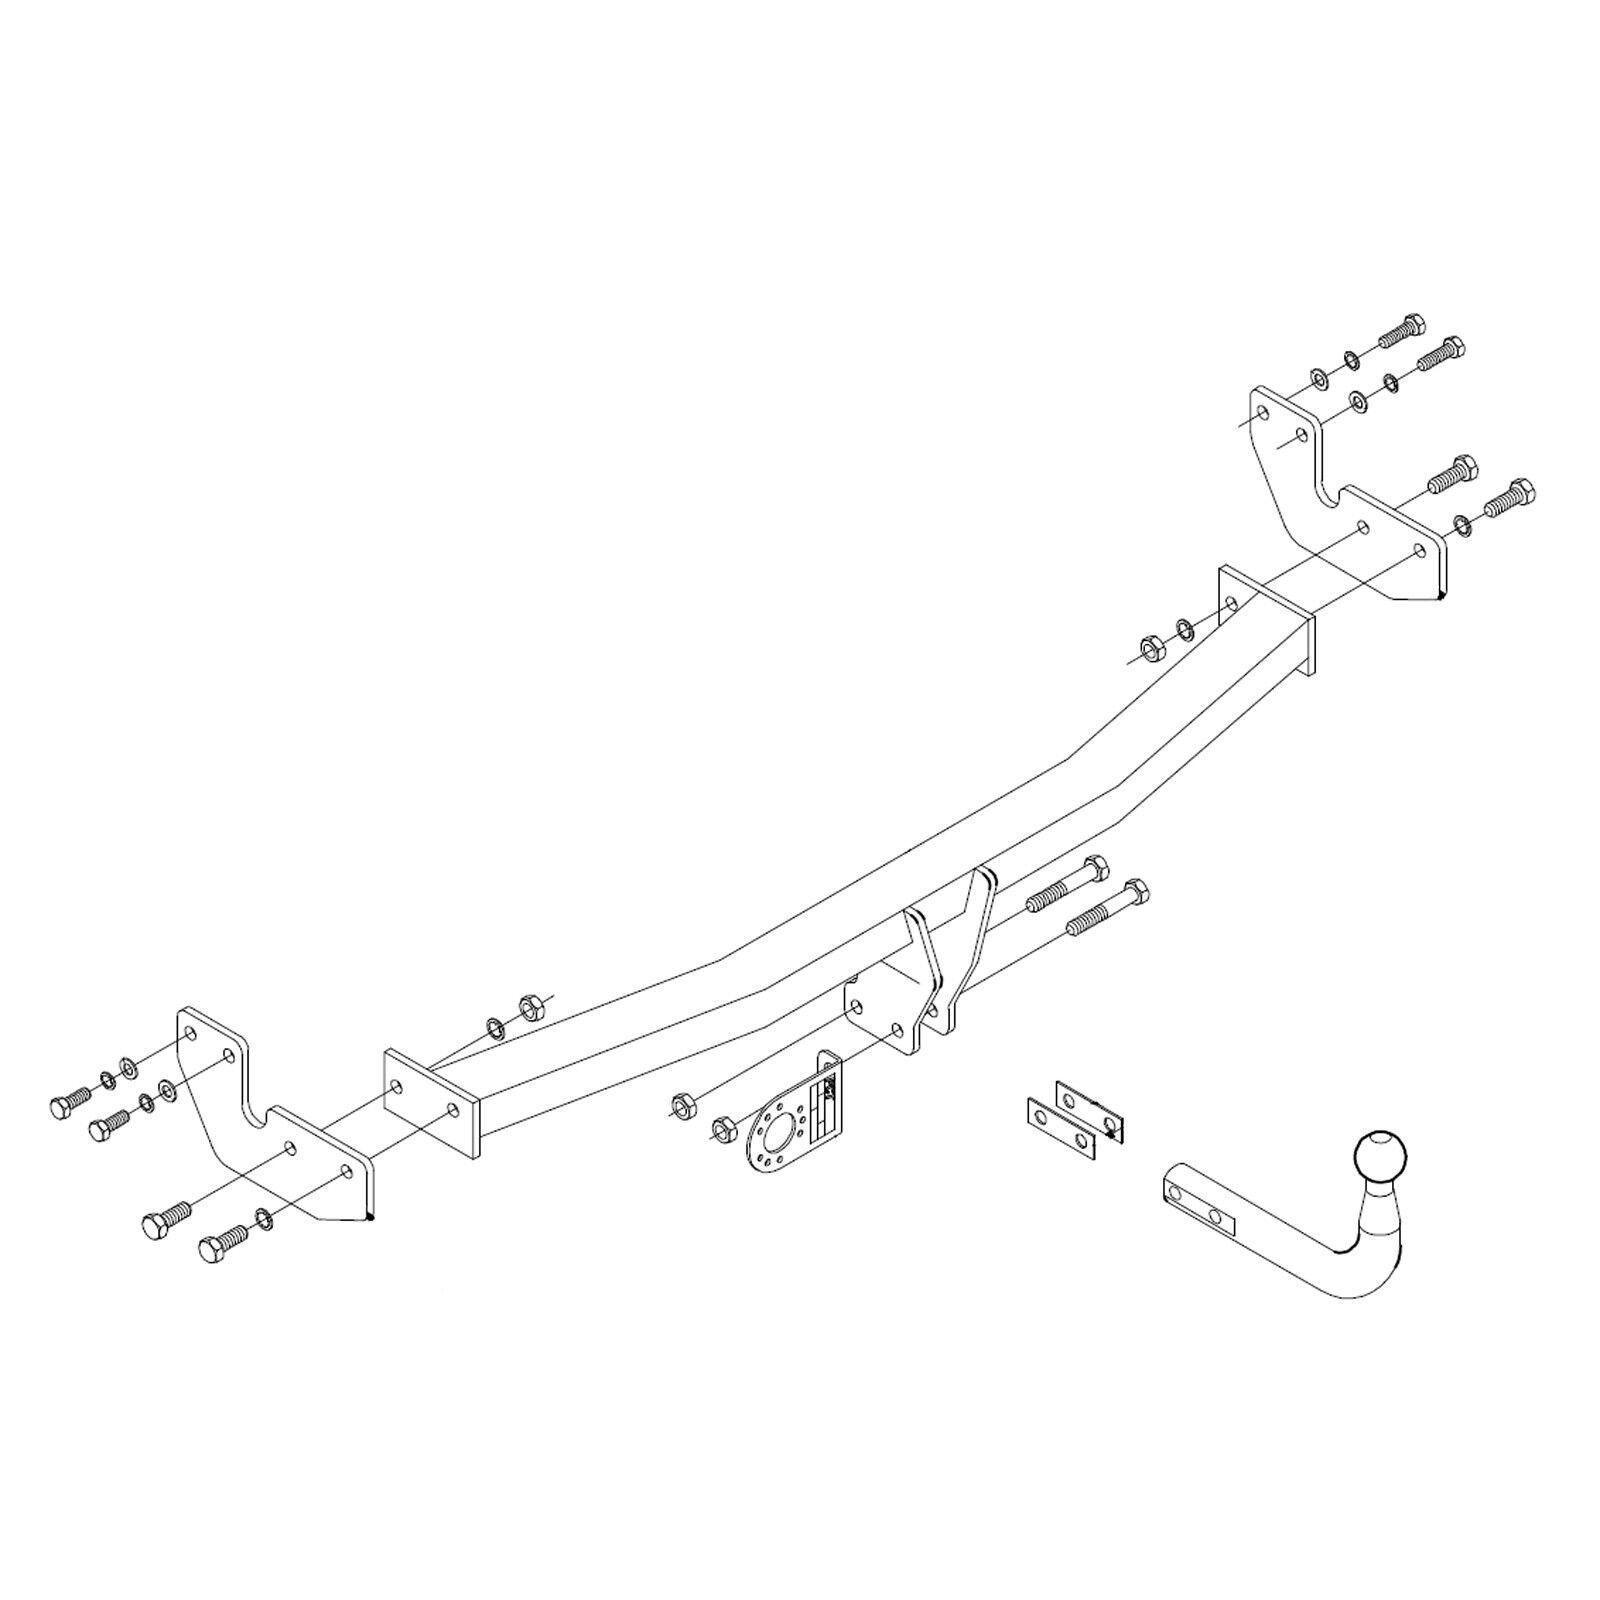 medium resolution of details about towbar for citroen c3 hatchback 2010 2016 swan neck tow bar